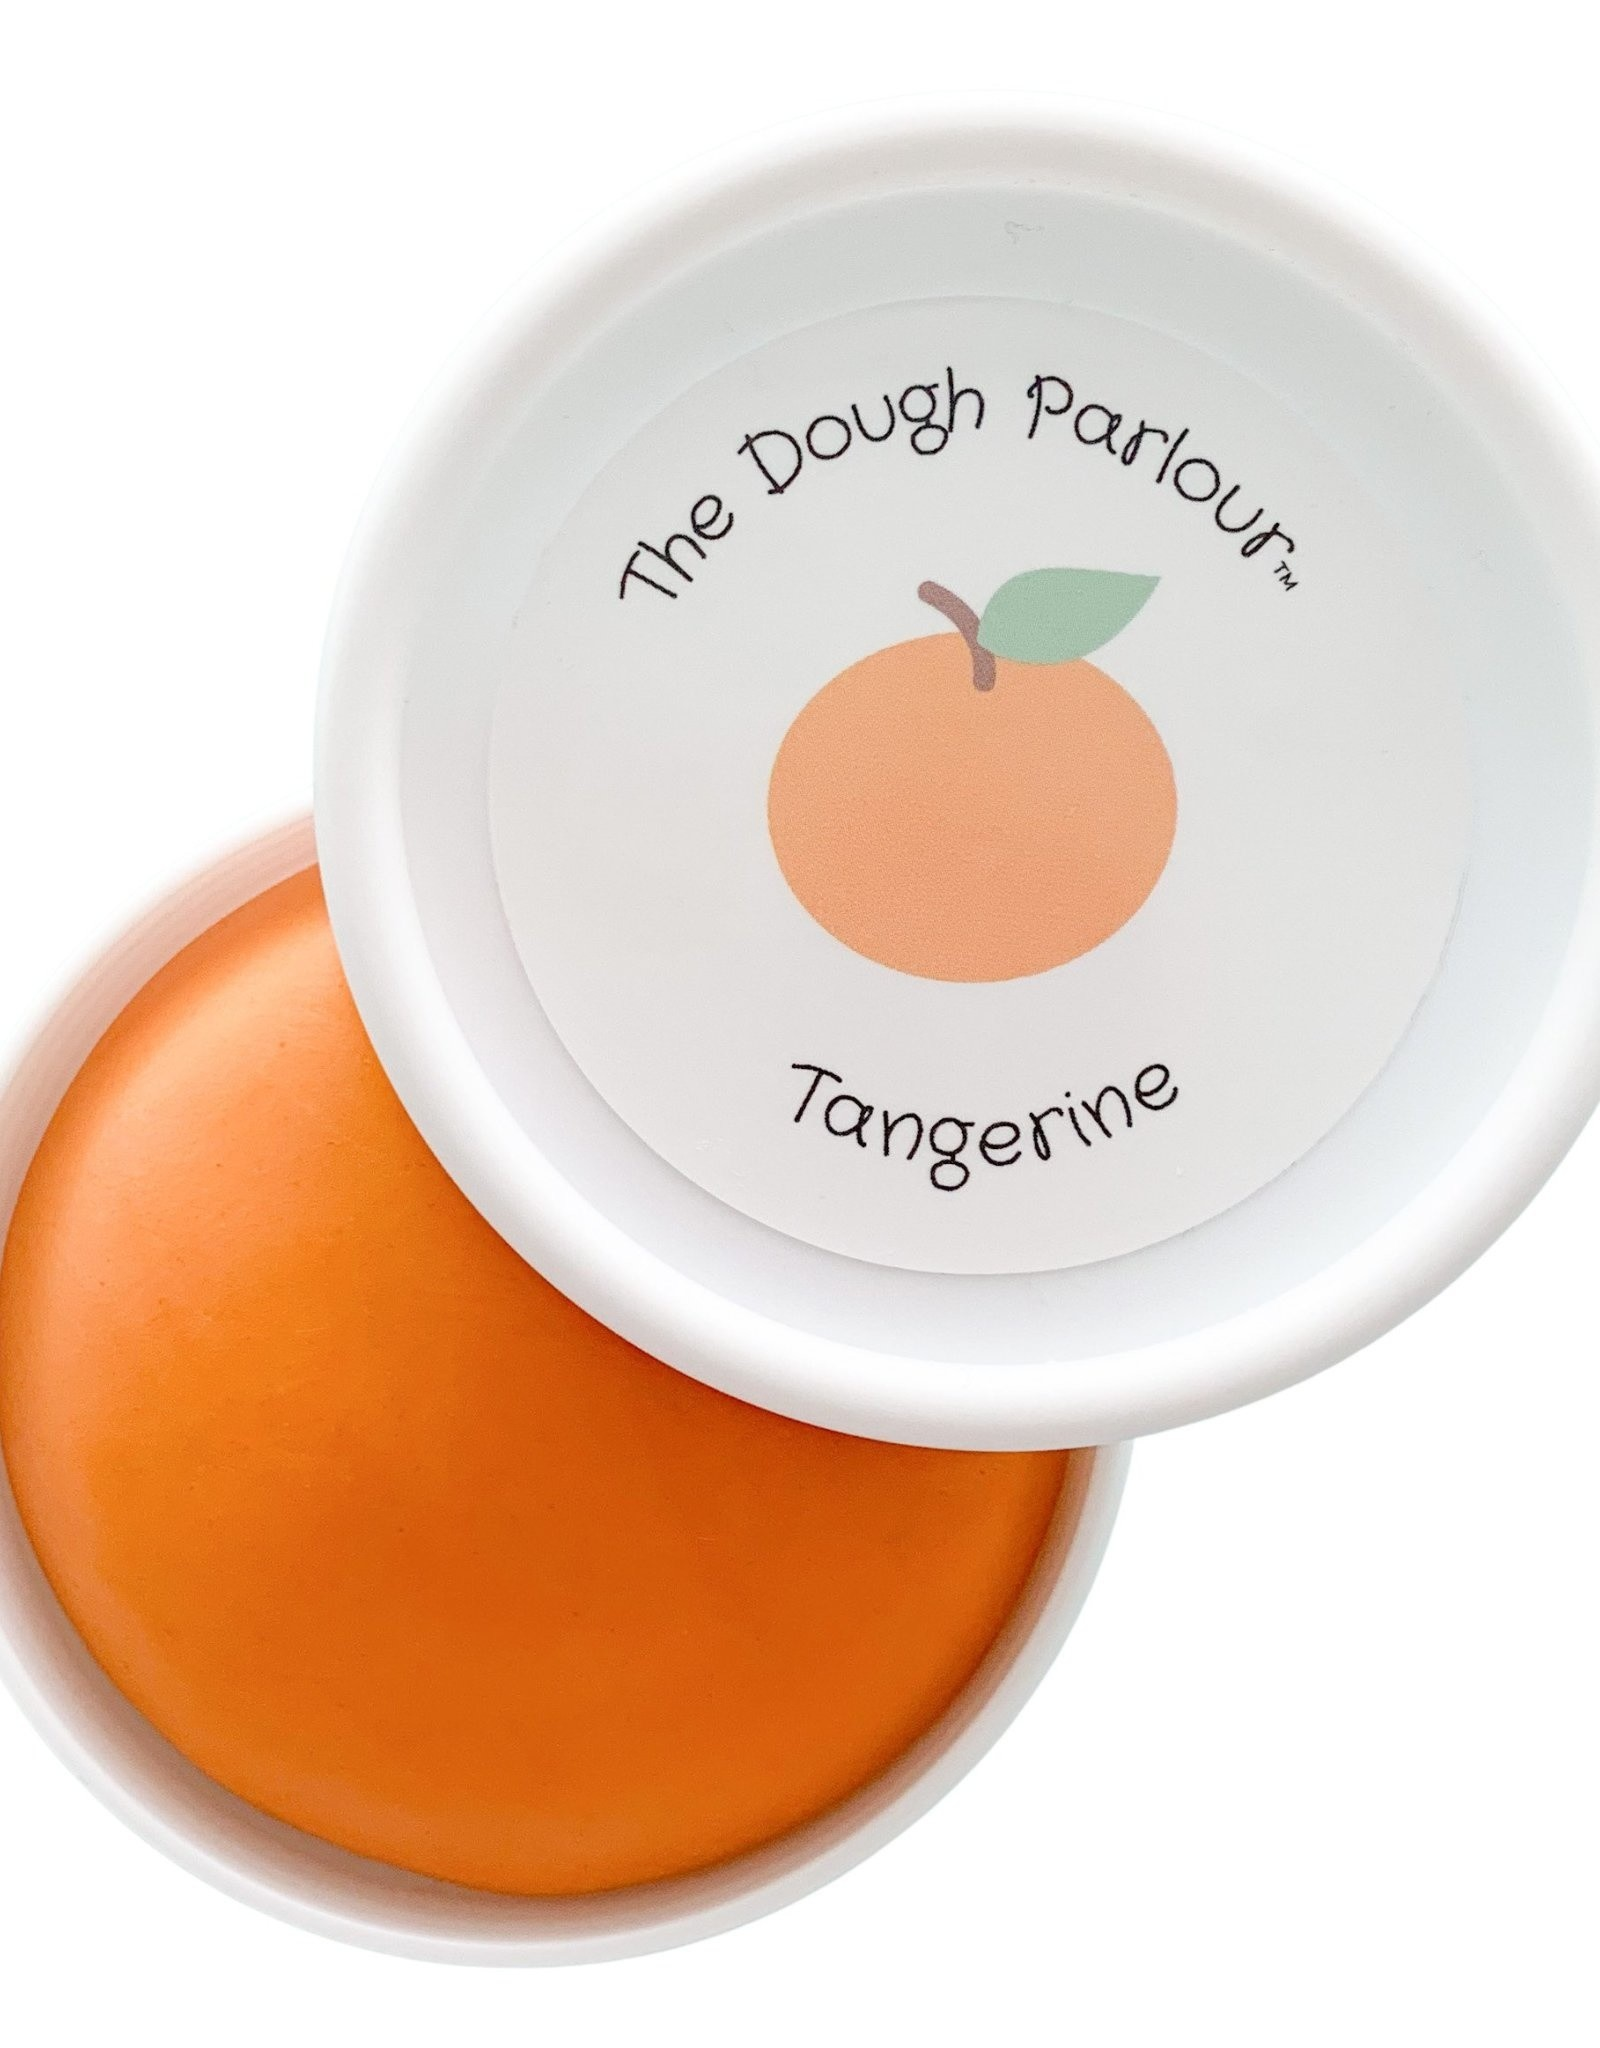 Dough Parlour Dough Parlour Play Dough - Tangerine